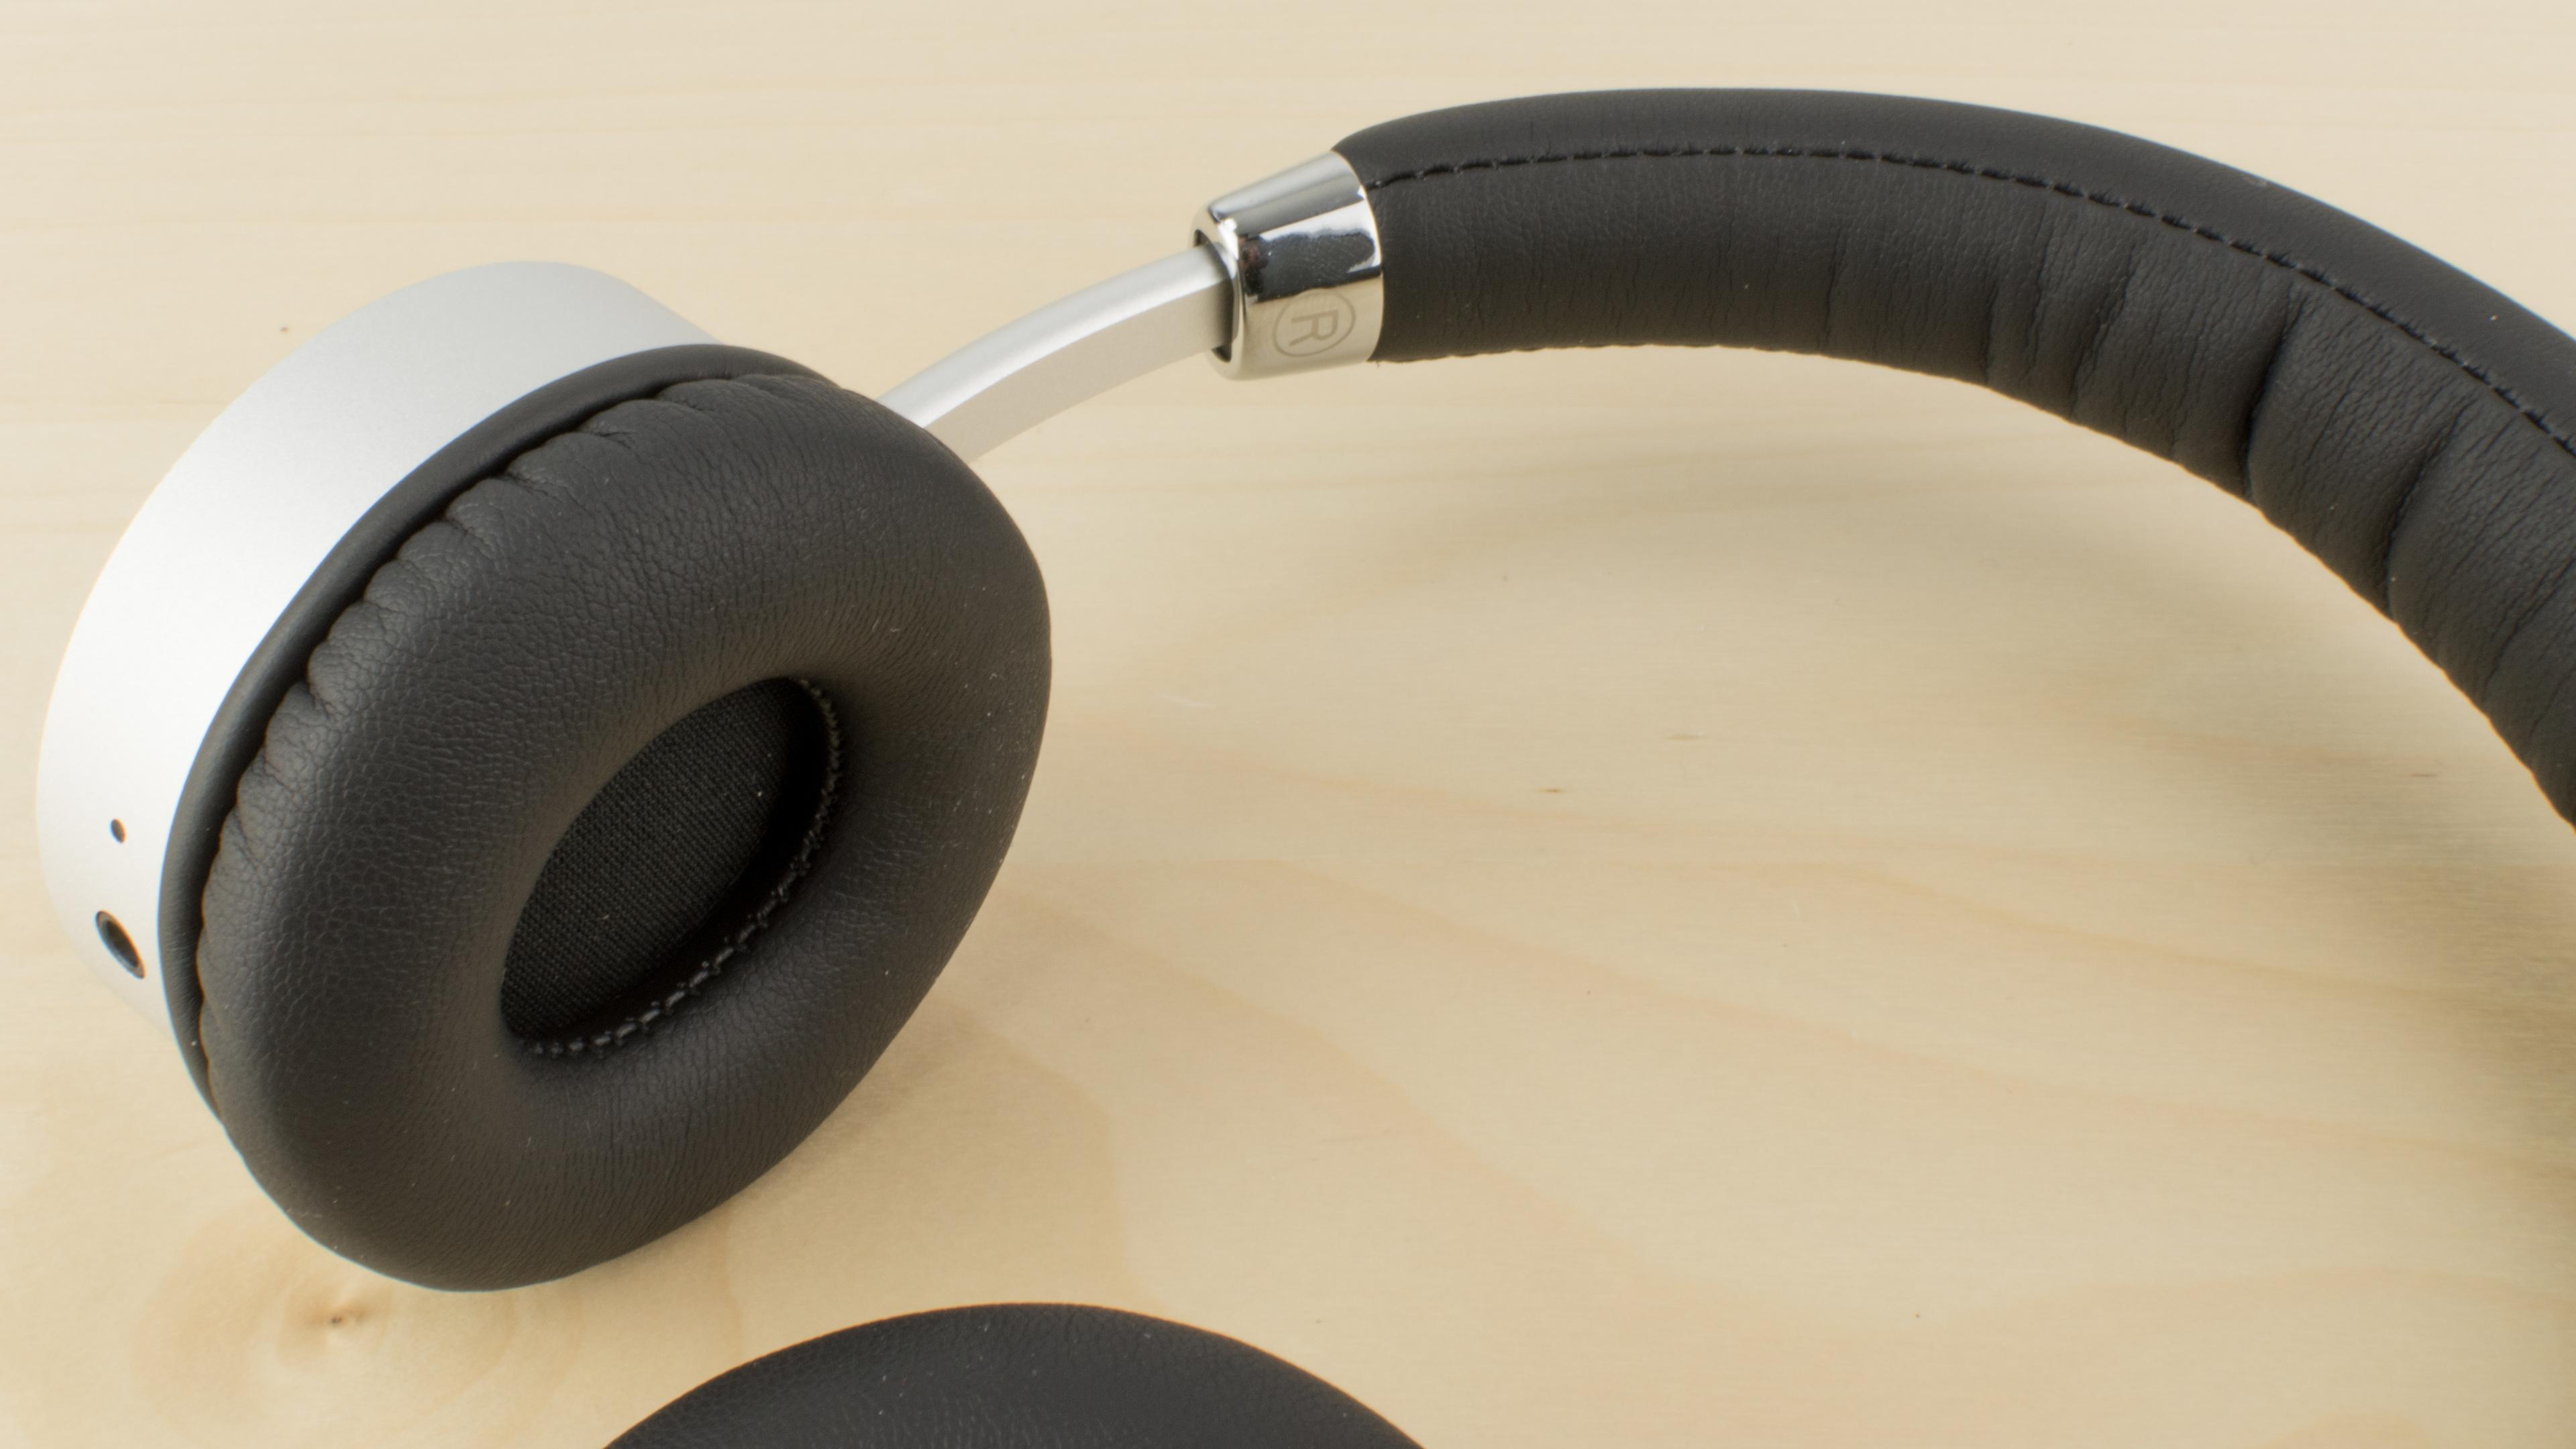 comforter samsung review level comfortable bluetooth headset headphones active